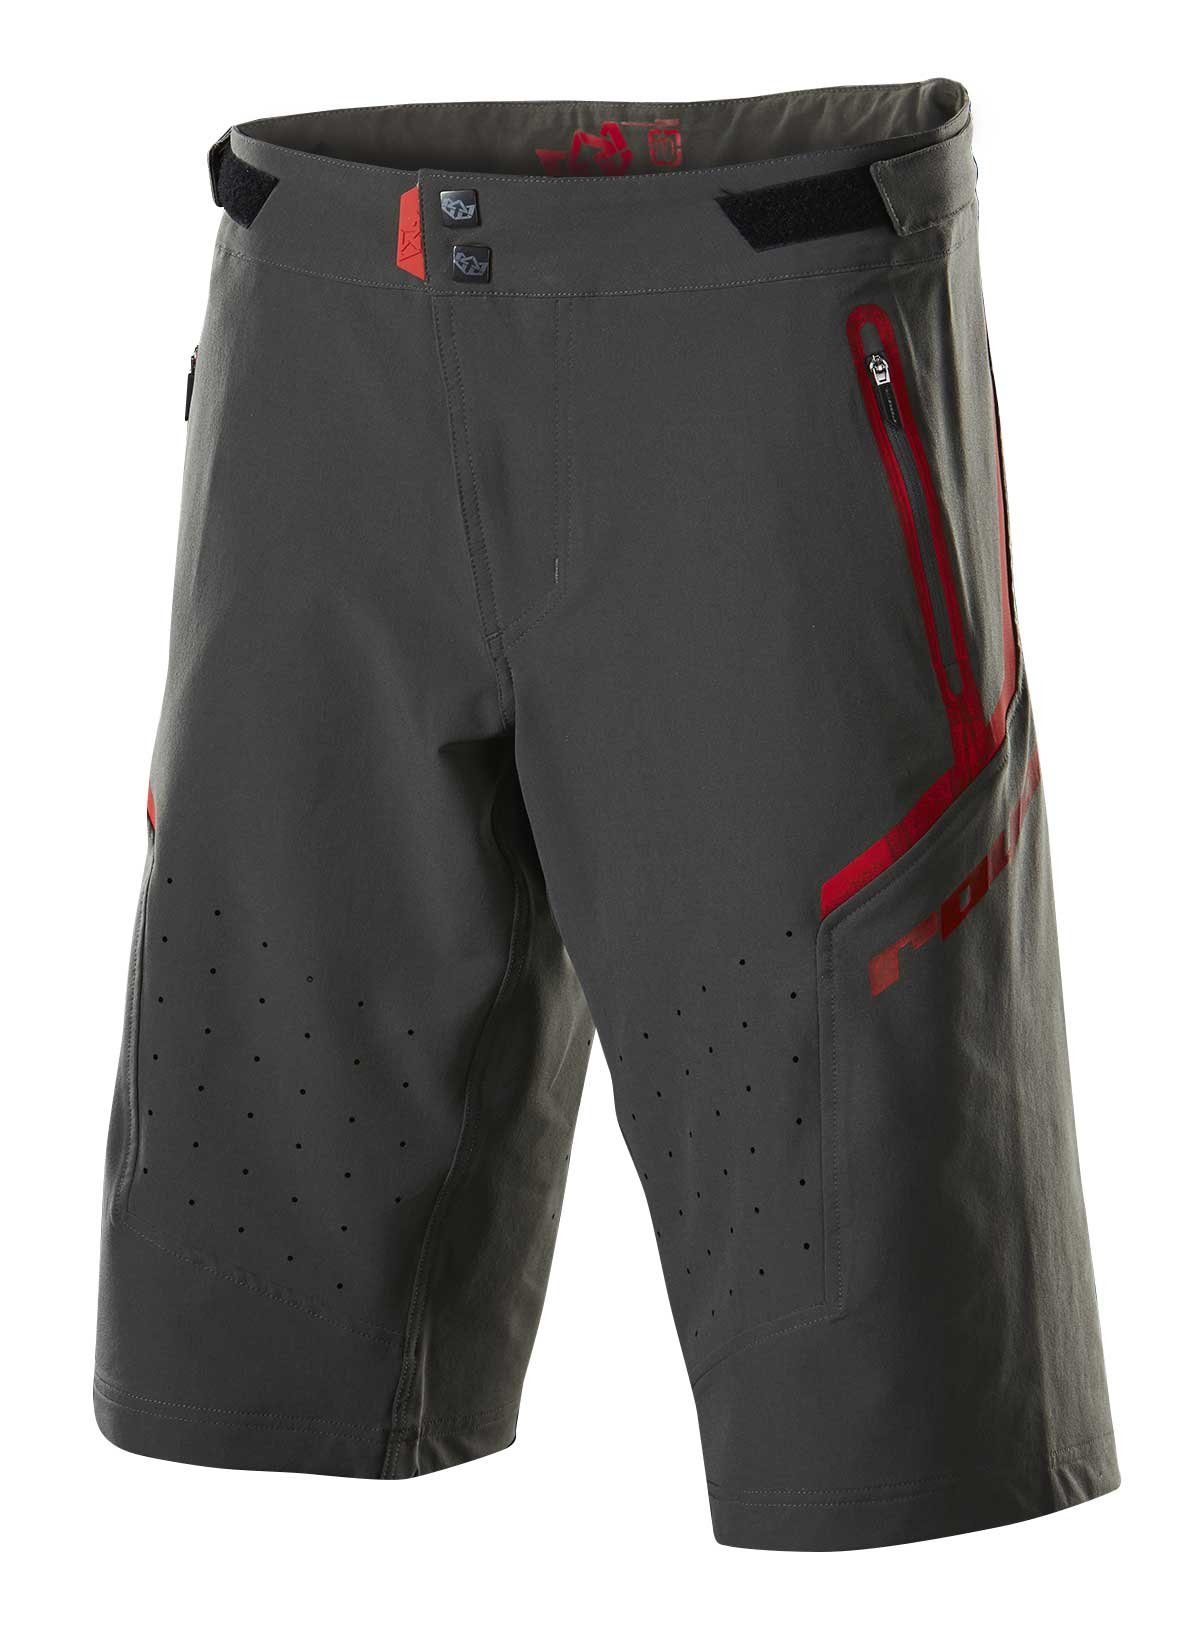 Royal Racing Impact Shorts, Charcoal/Flo Red, X-Large